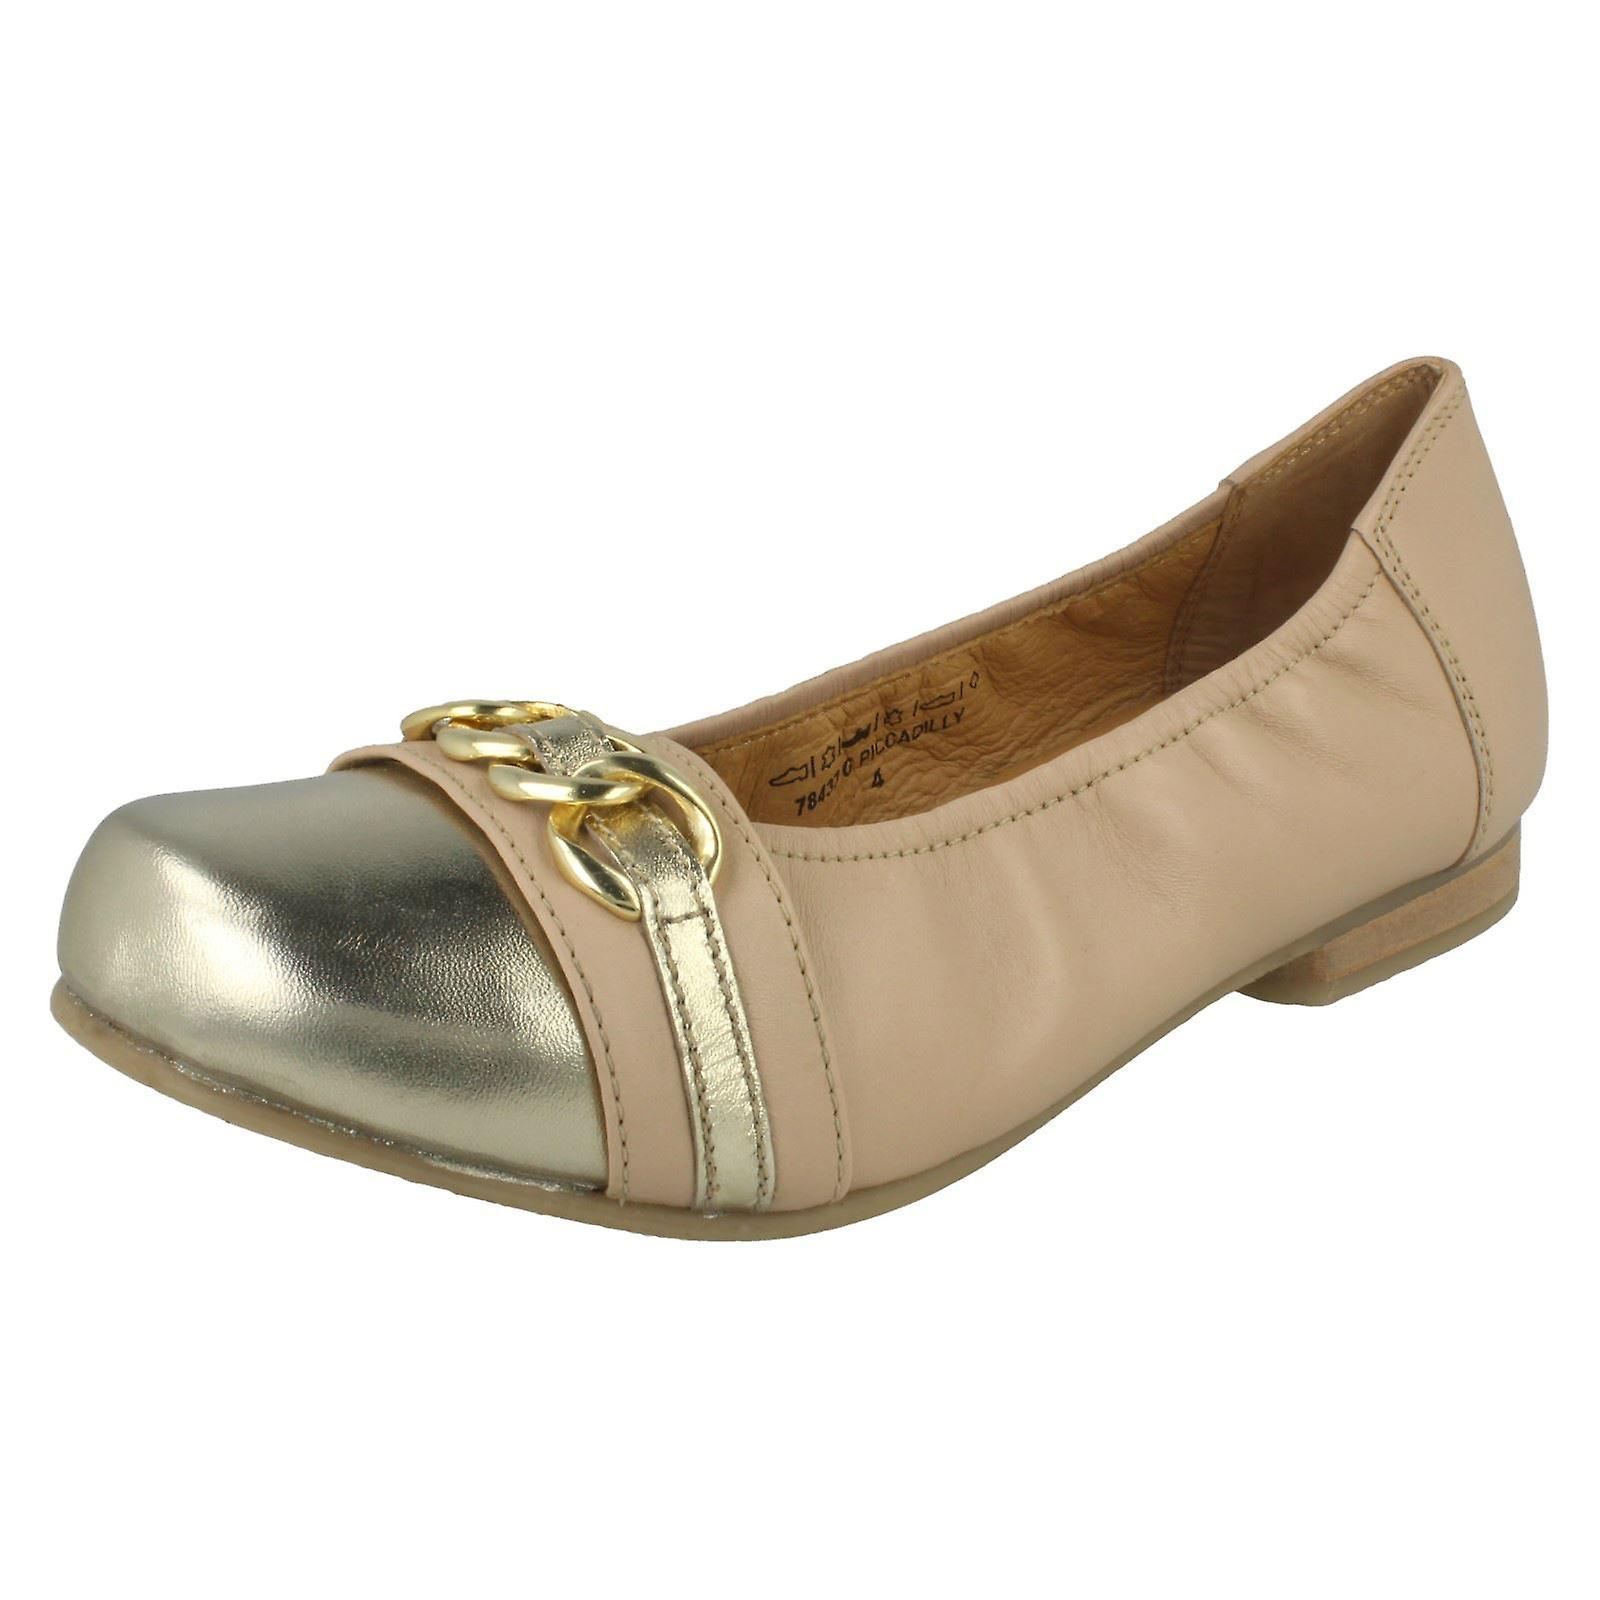 B łatwo wsuwane buty damskie buty Piccadilly qn1gy